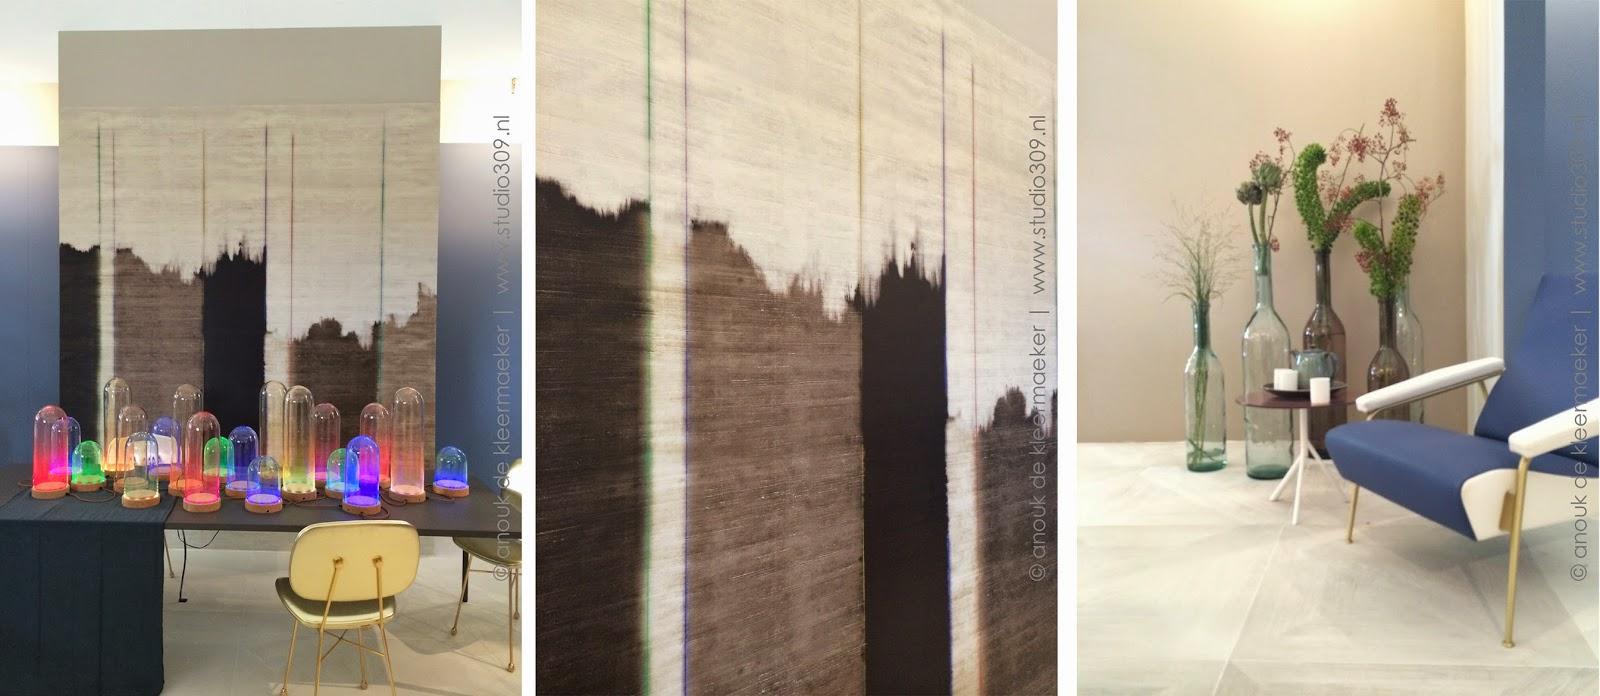 Veelsoeps eigen huis interieur en more than classic for Huis en interieur